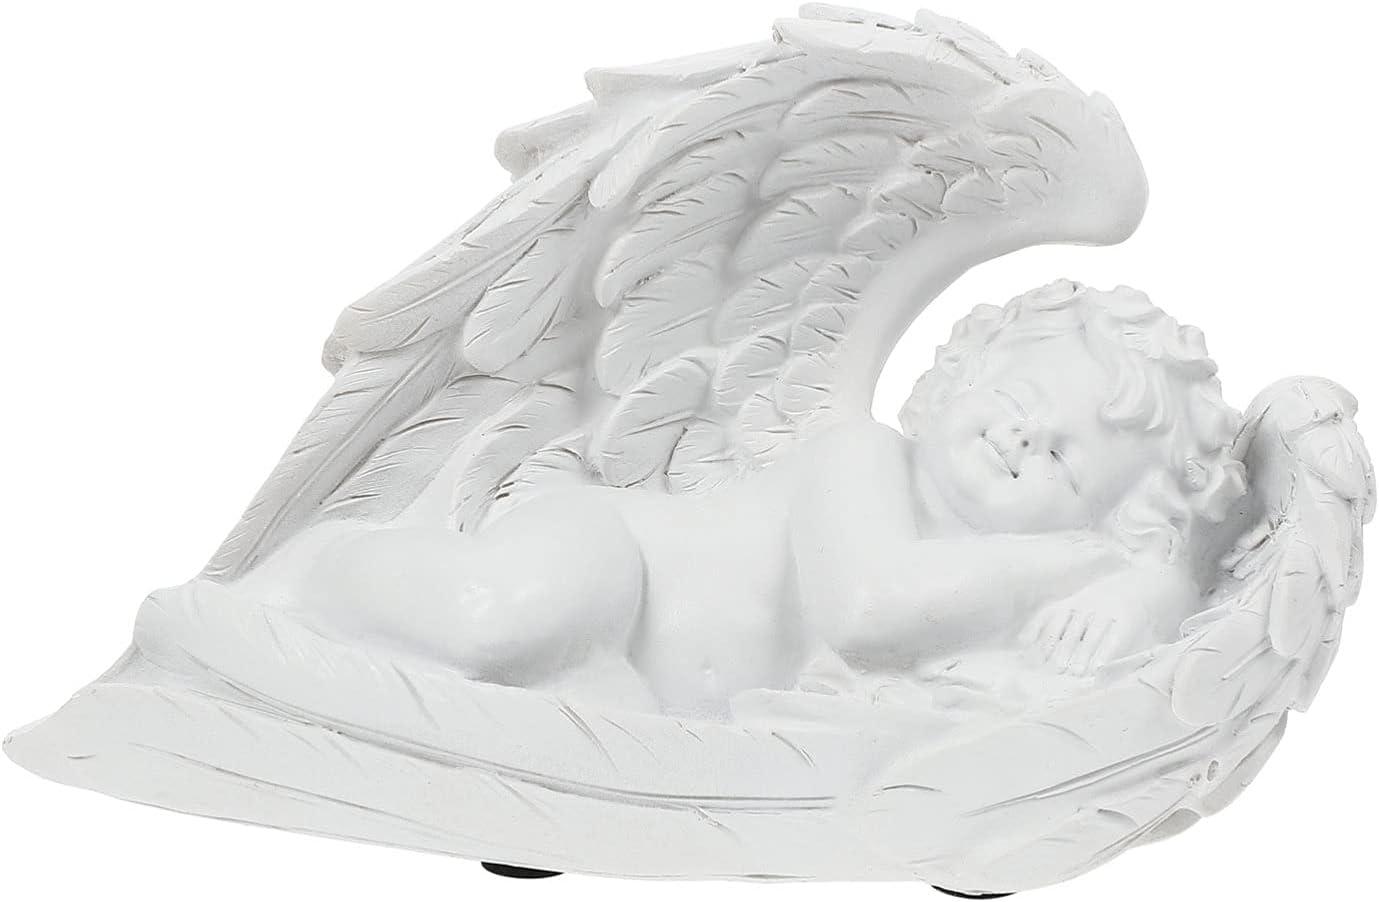 IMIKEYA Angel Cupid Garden Statue Marker Memorial S Manufacturer regenerated product Large discharge sale Grave